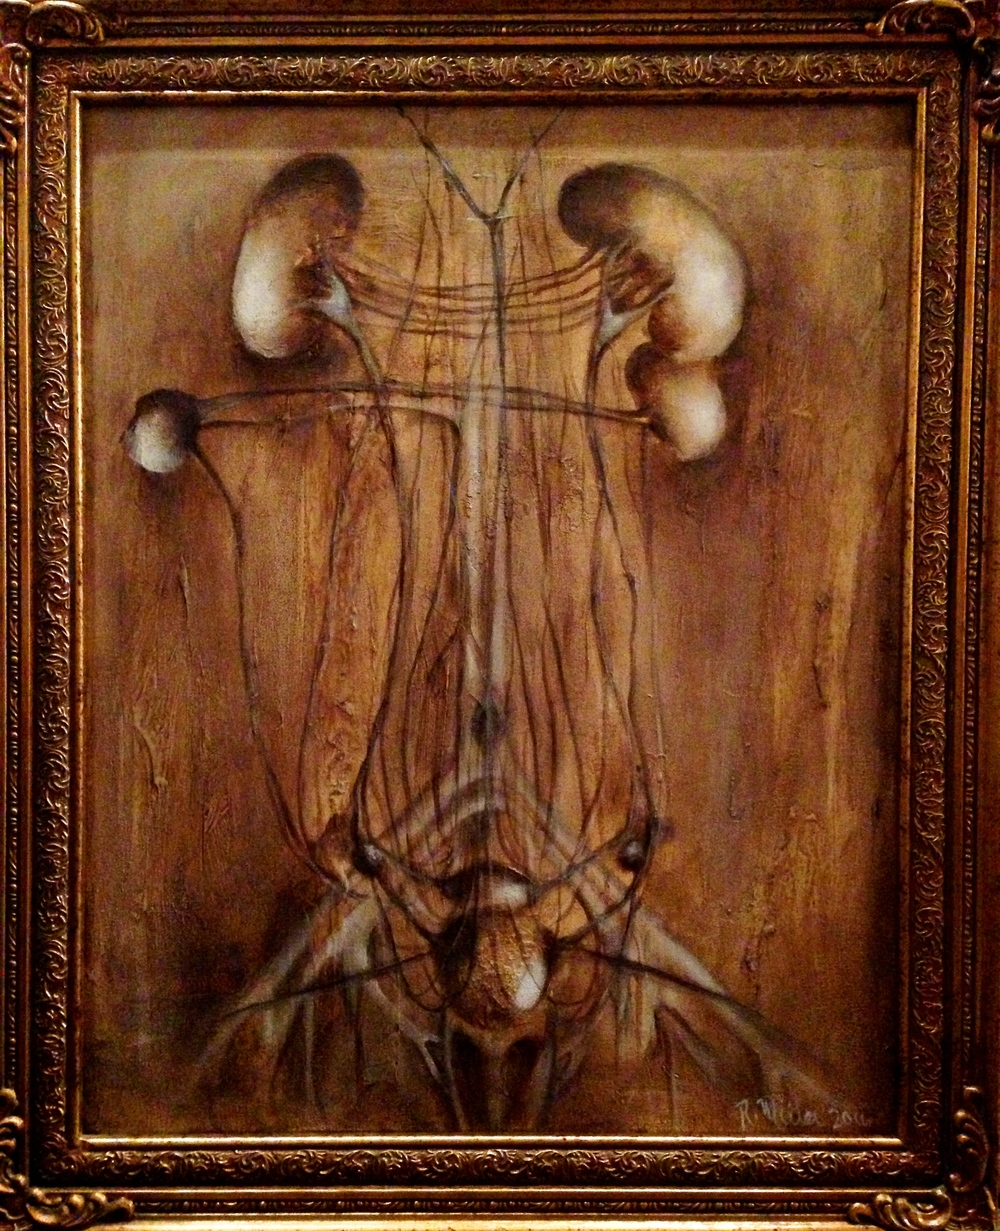 (framed)Artnatomy I, 2016 Mixed media on canvas